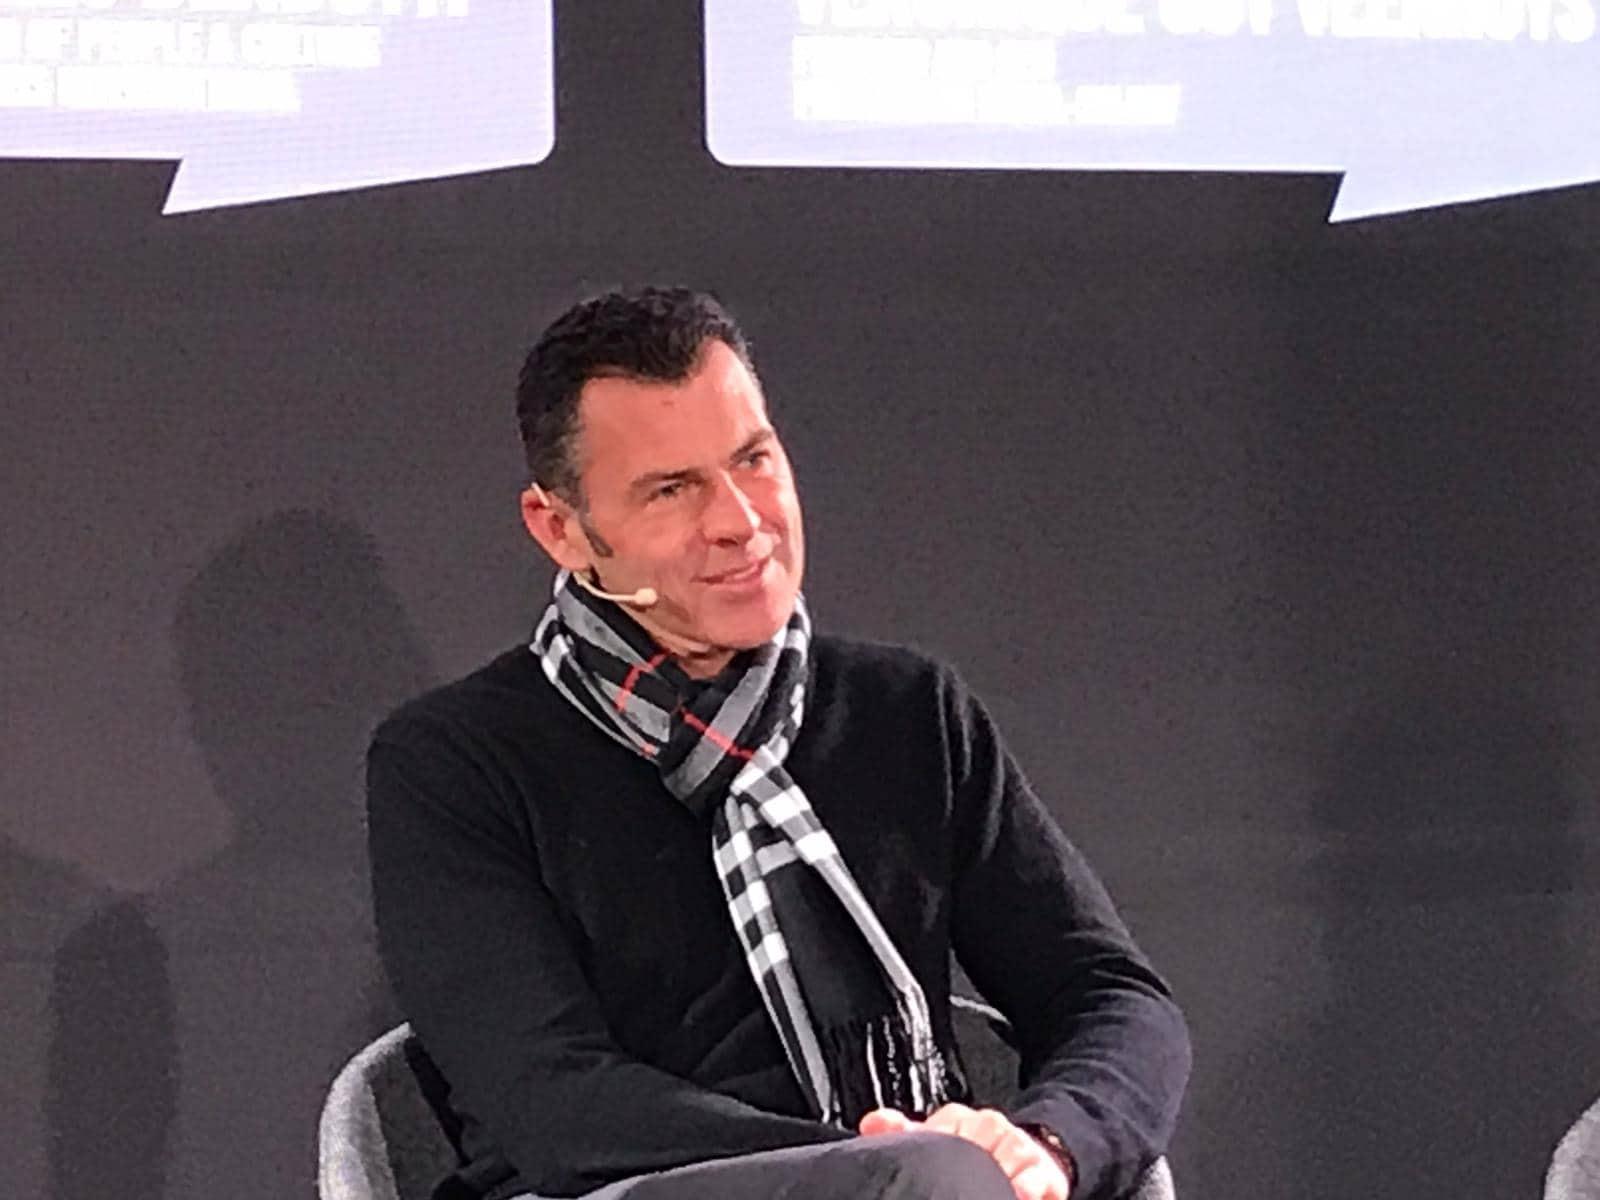 Charles Bendotti PMI equal salary Davos panel